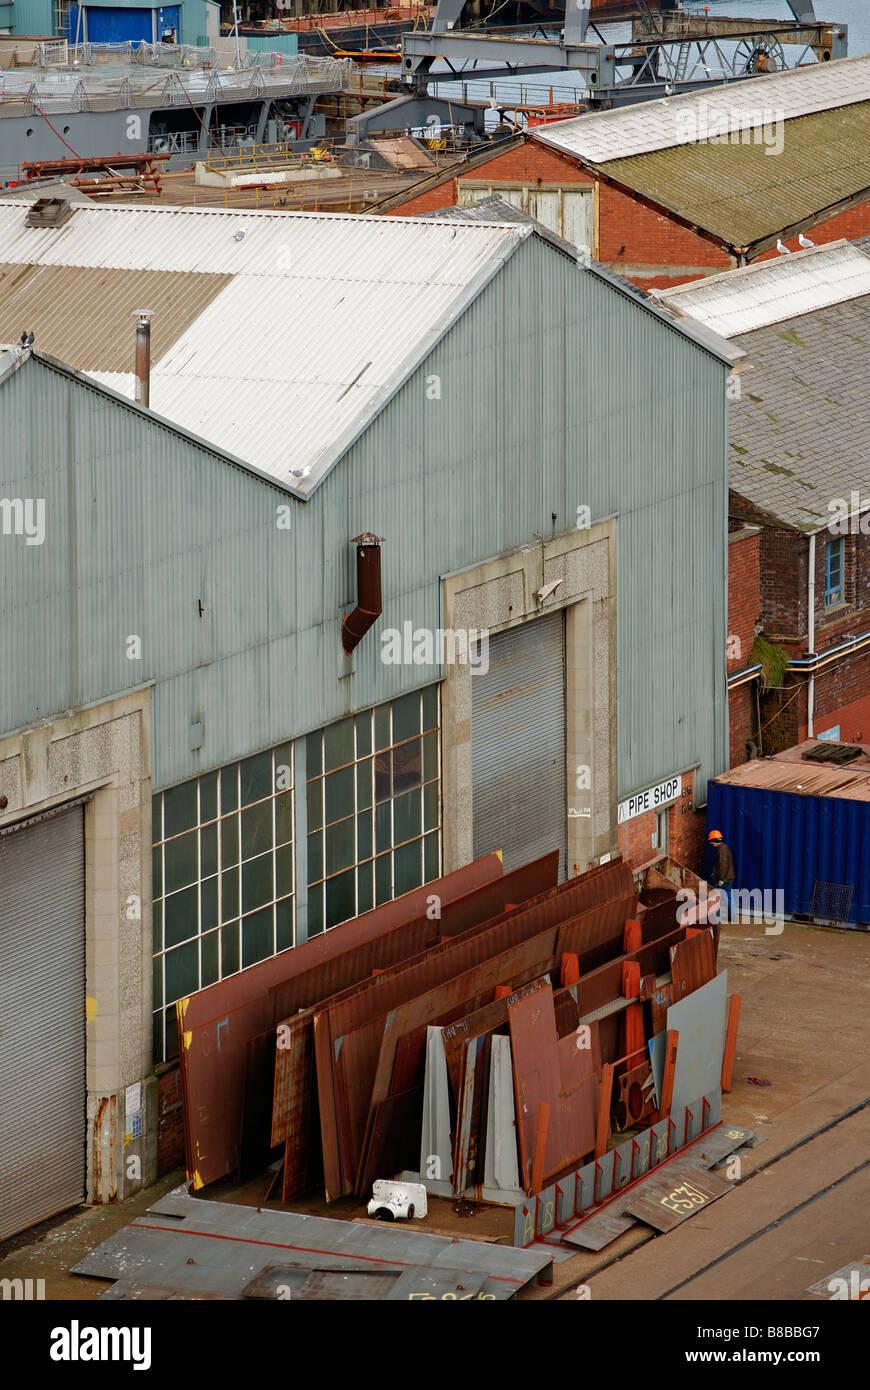 À l'entreposage industriel,chantier pendennis falmouth, Cornwall, uk Photo Stock